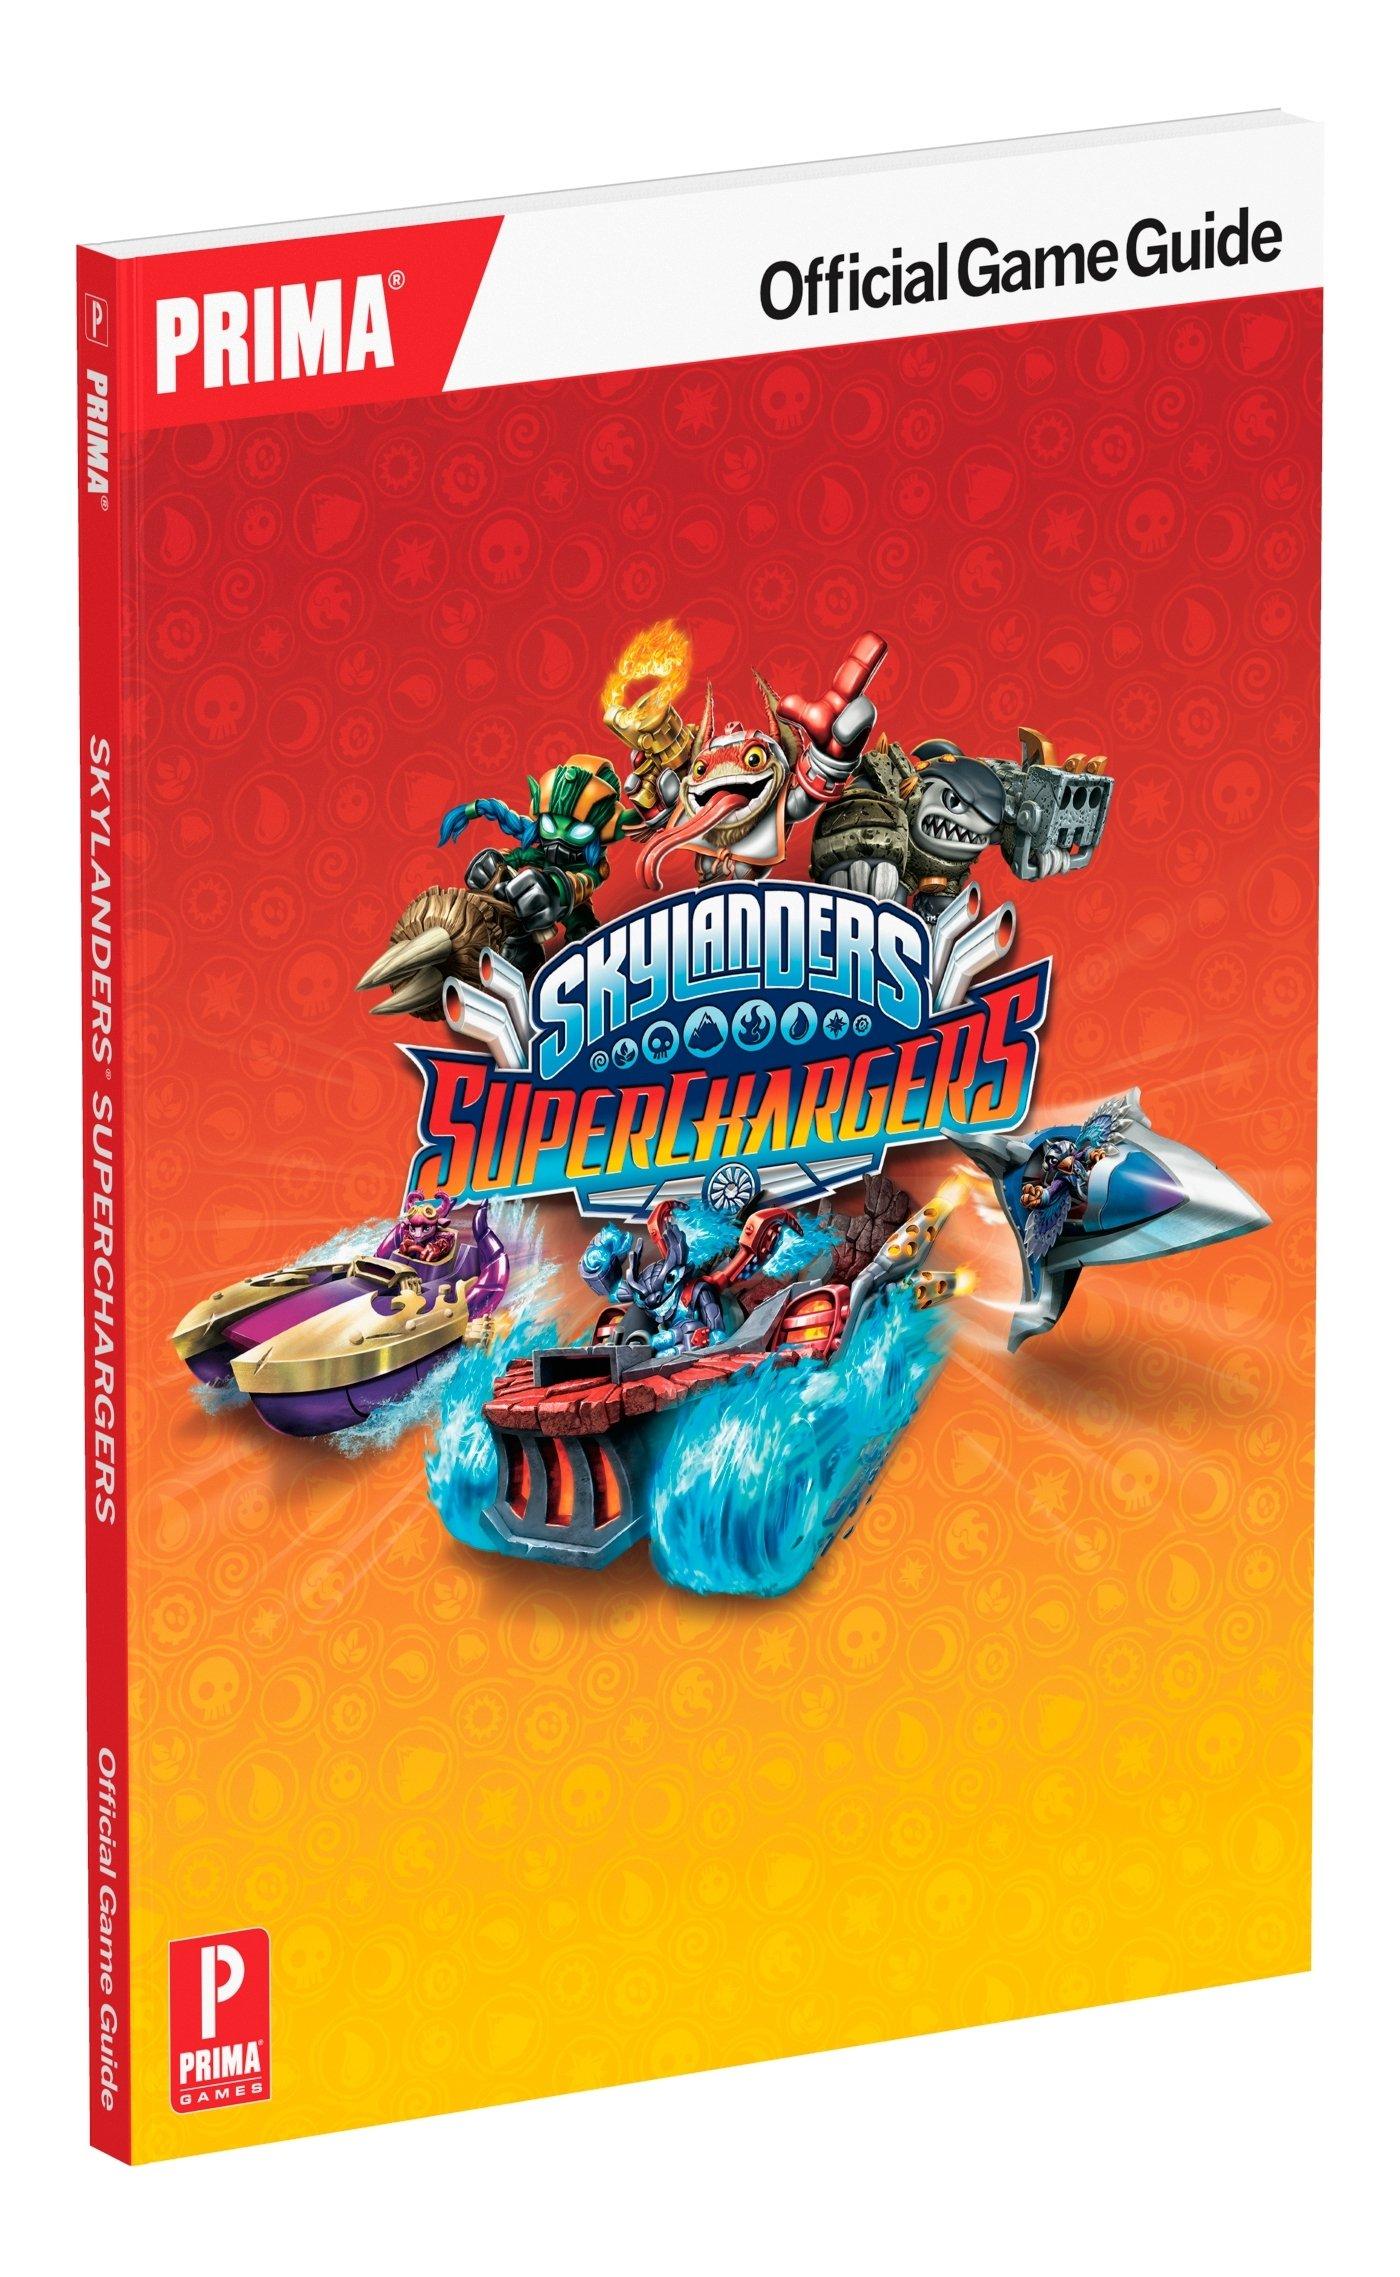 skylanders superchargers official strategy guide standard edition rh amazon co uk Skylanders Spyro's Adventure Skylanders Swap Force